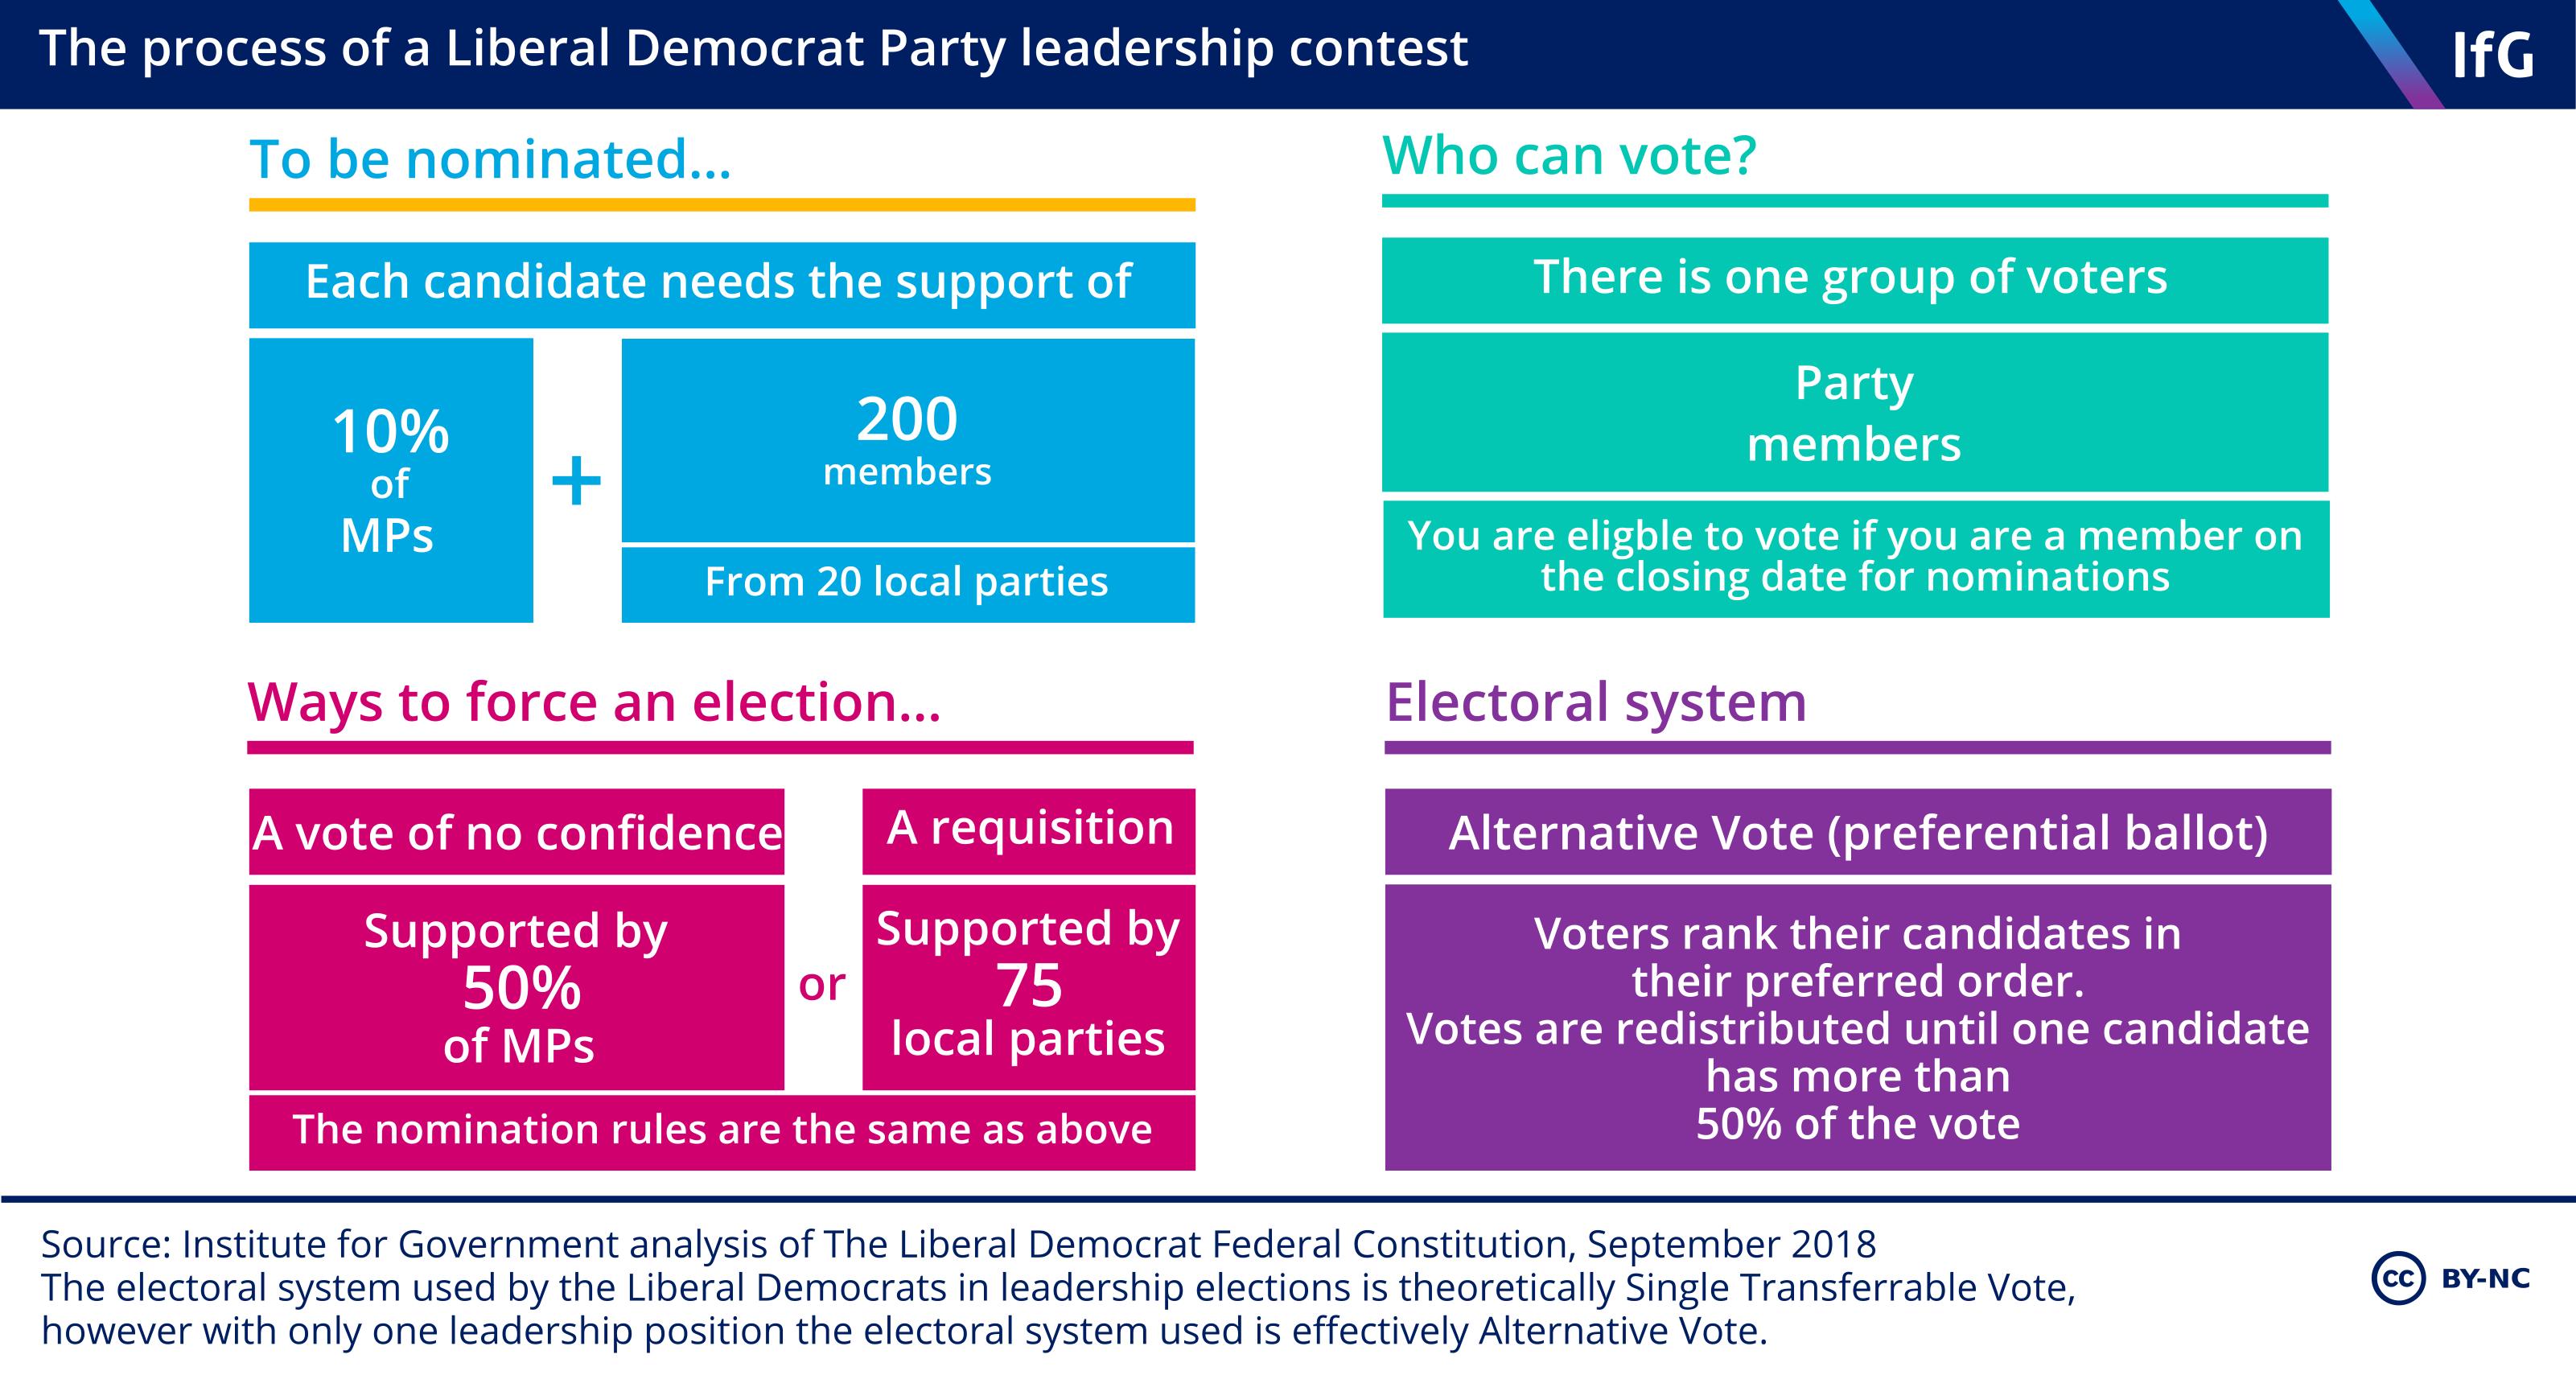 The process of a Liberal Democrat leadership contest